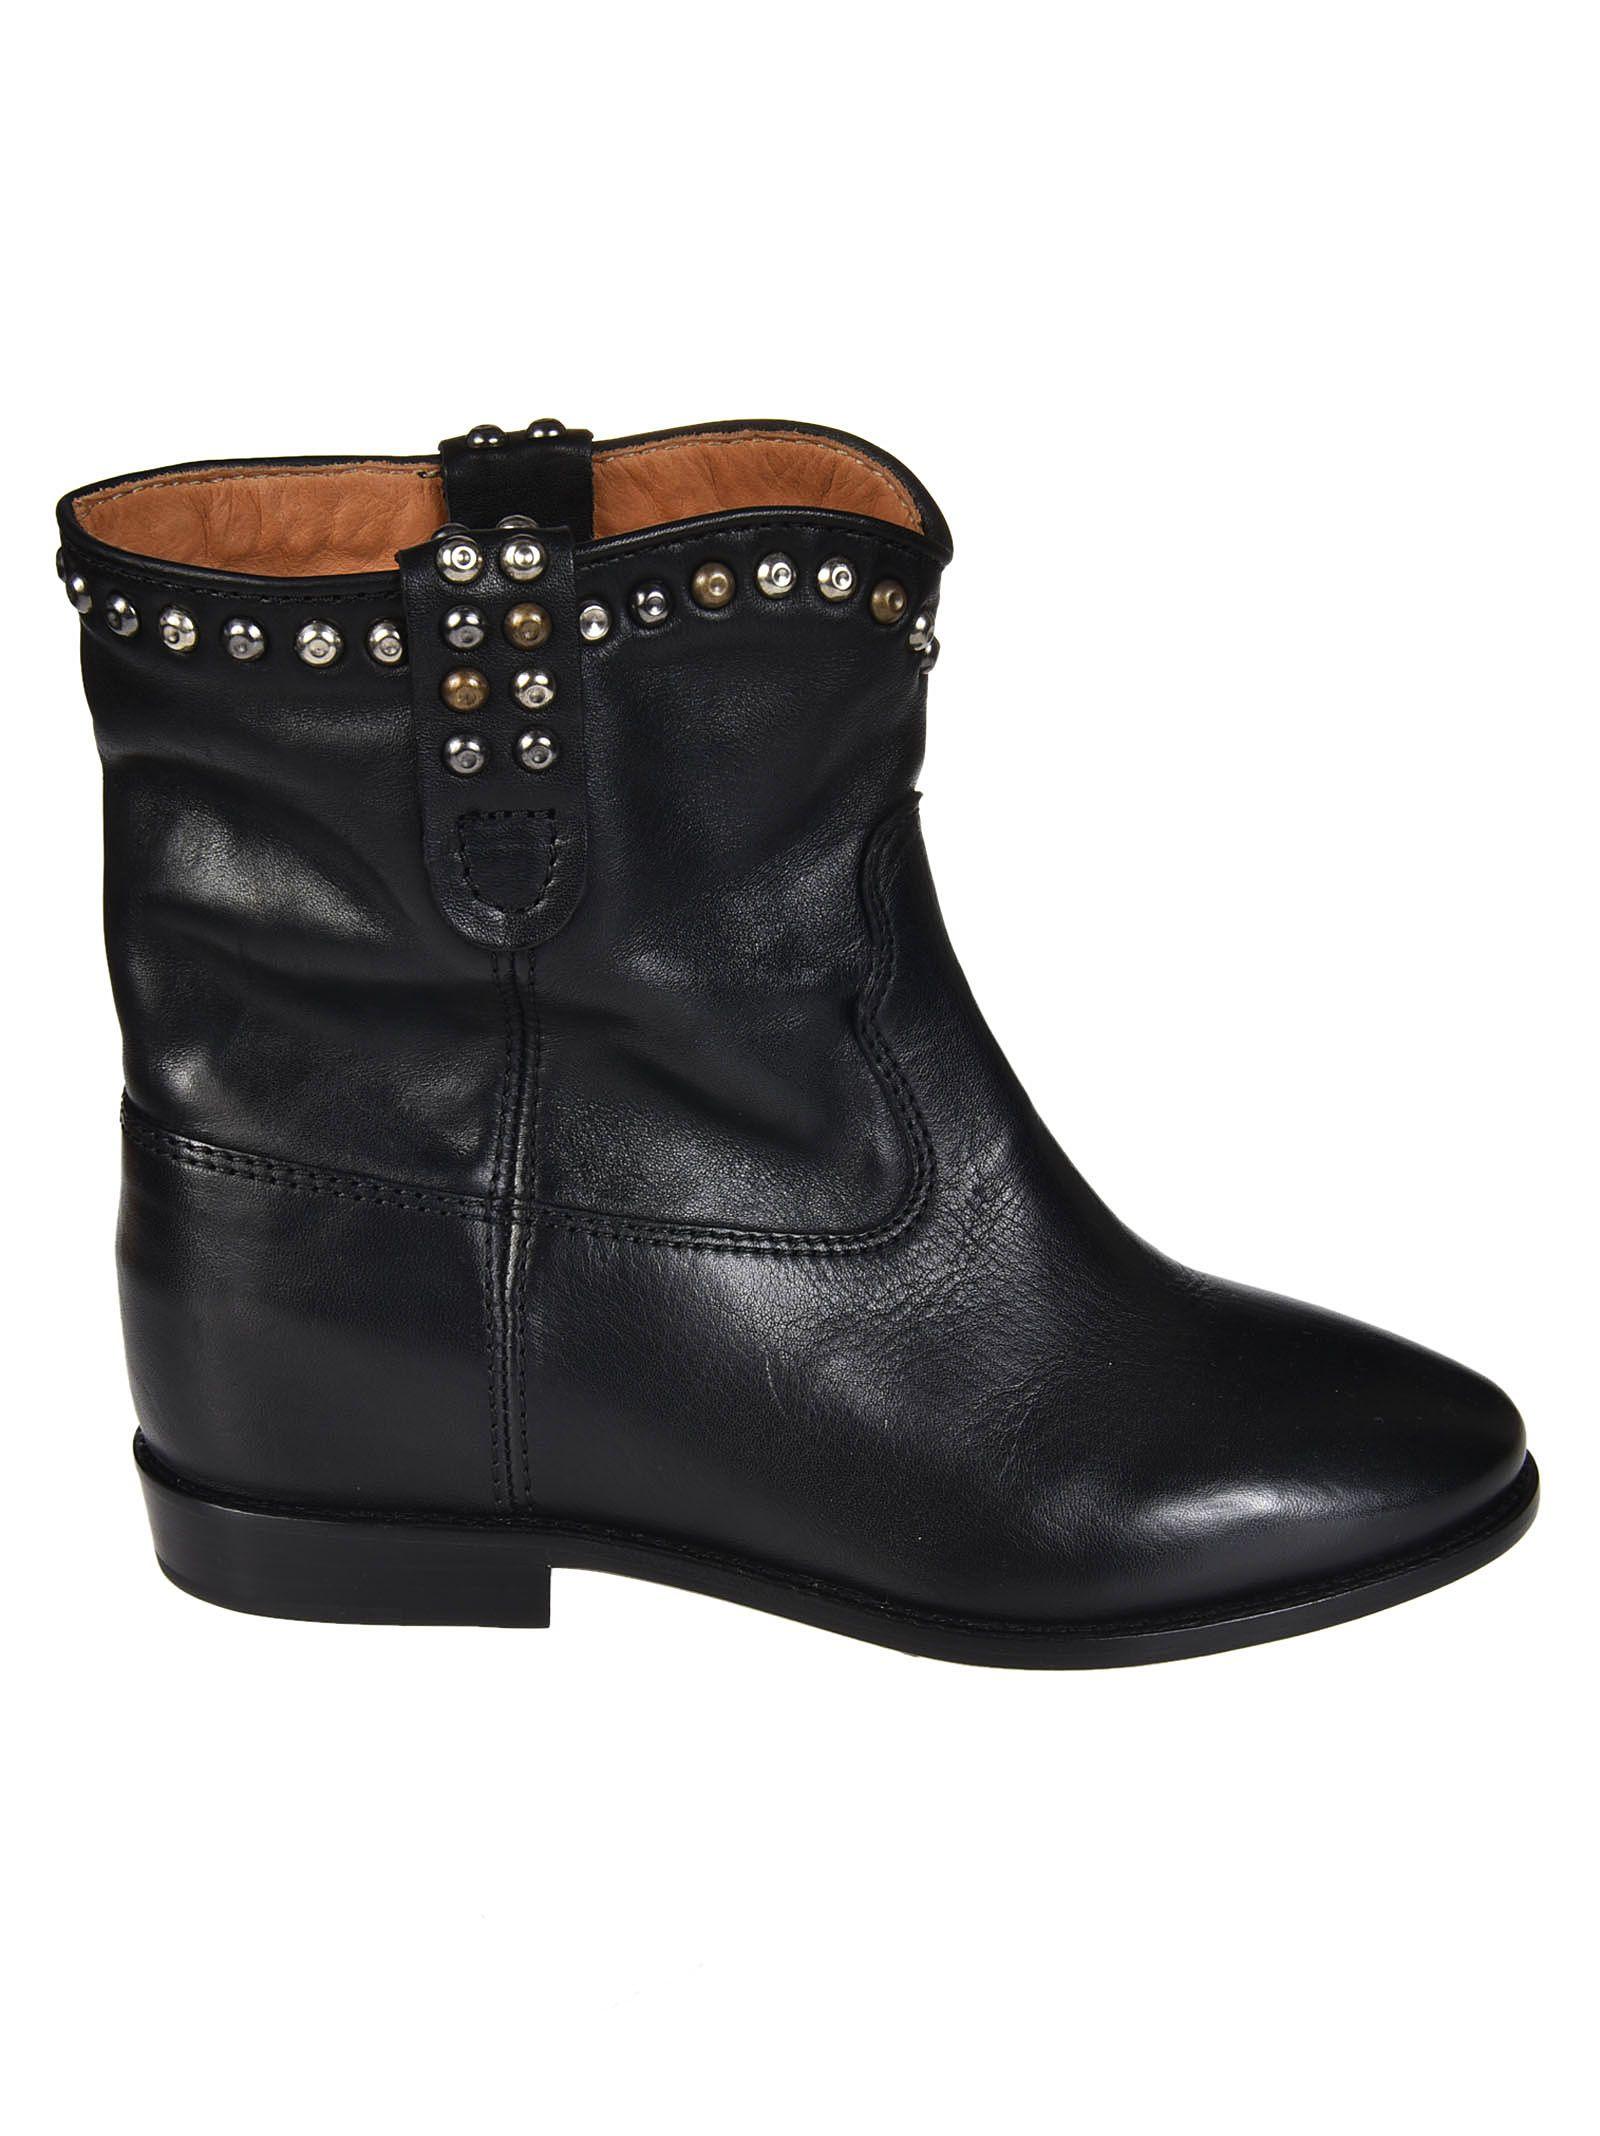 isabel marant isabel marant cluster boots black women 39 s boots italist. Black Bedroom Furniture Sets. Home Design Ideas